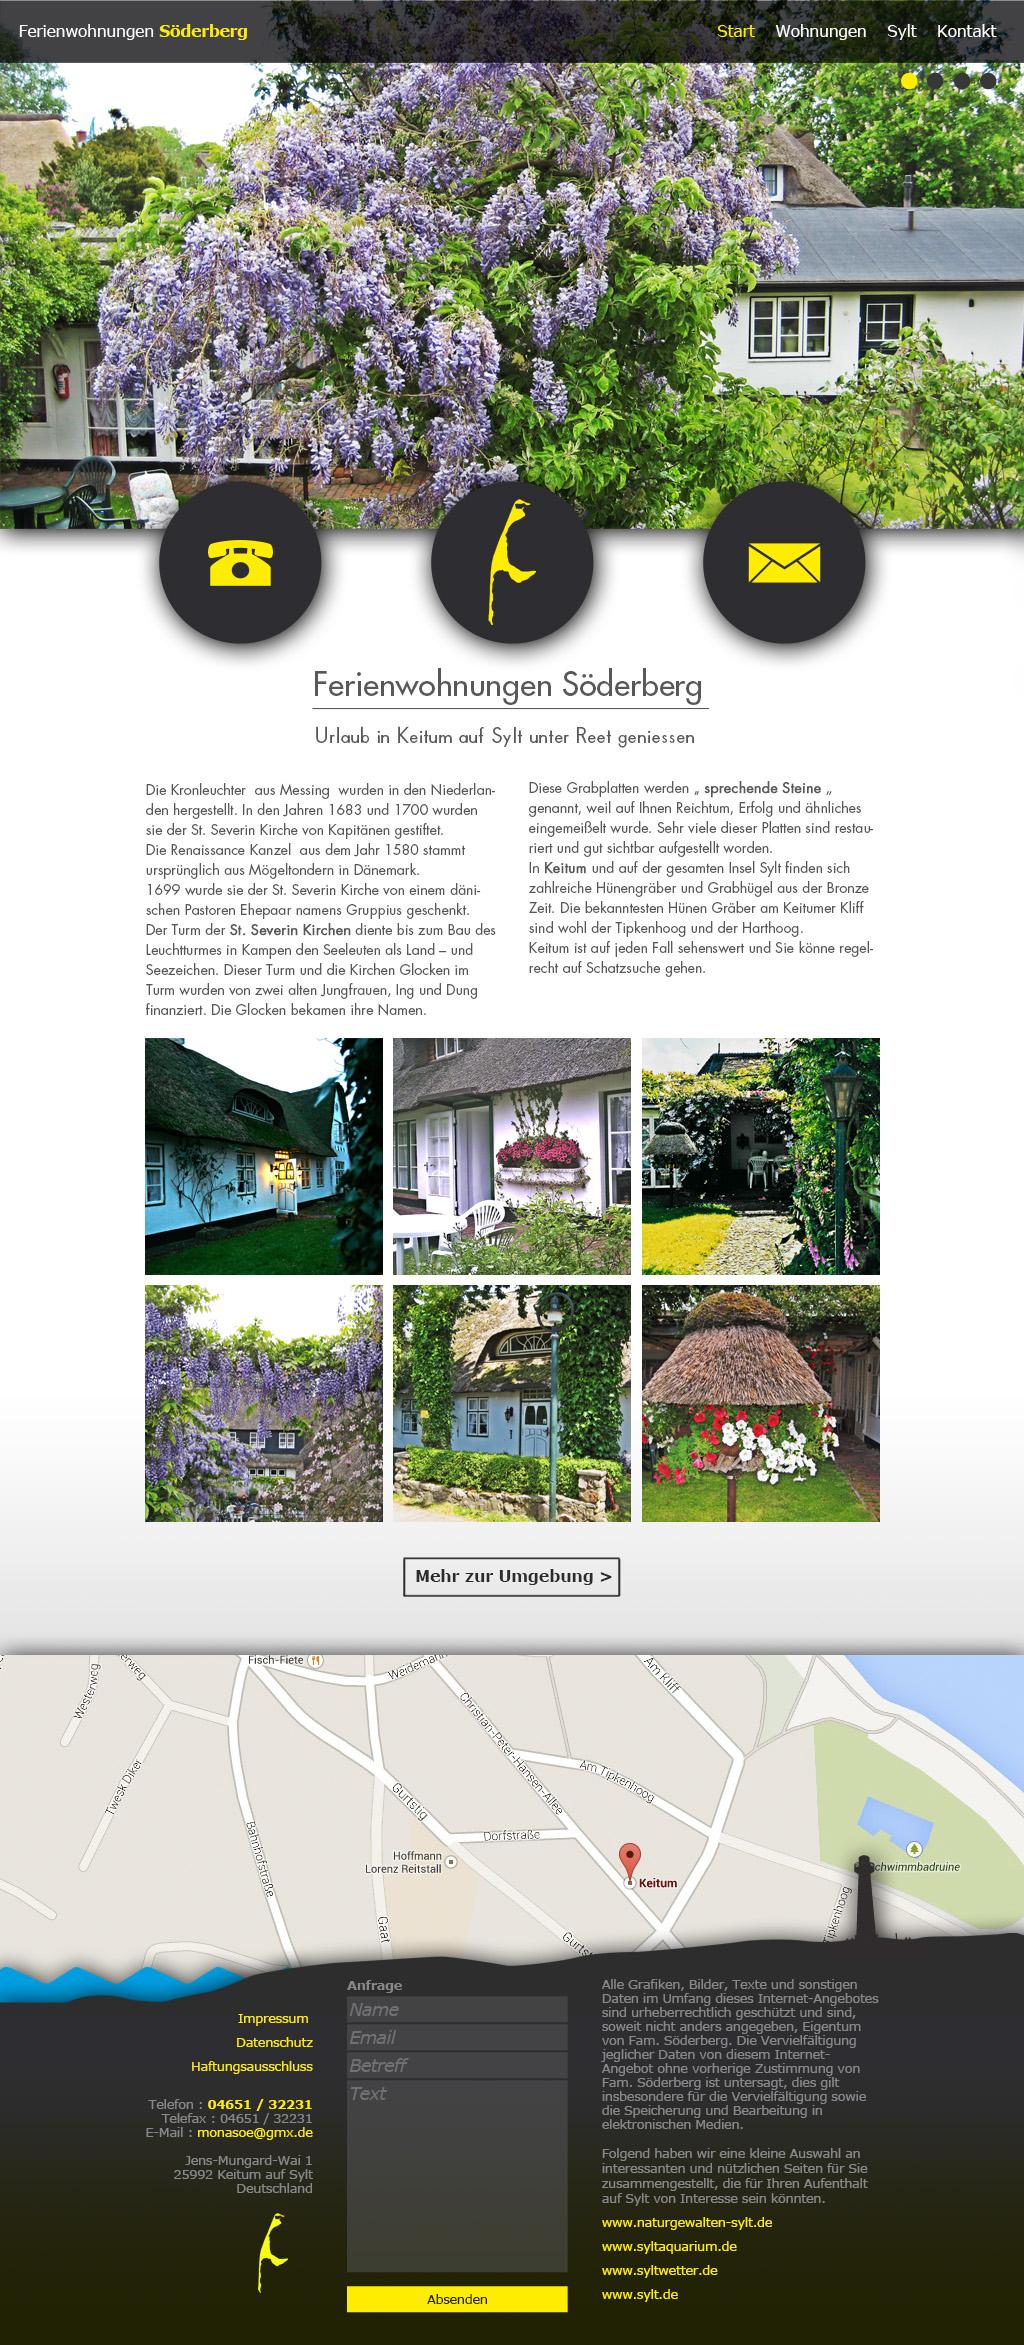 screendesign, webdesign, cms, content management, css, php, ruby on rails, html5, wordpress, joomla, design, waldbrand® media